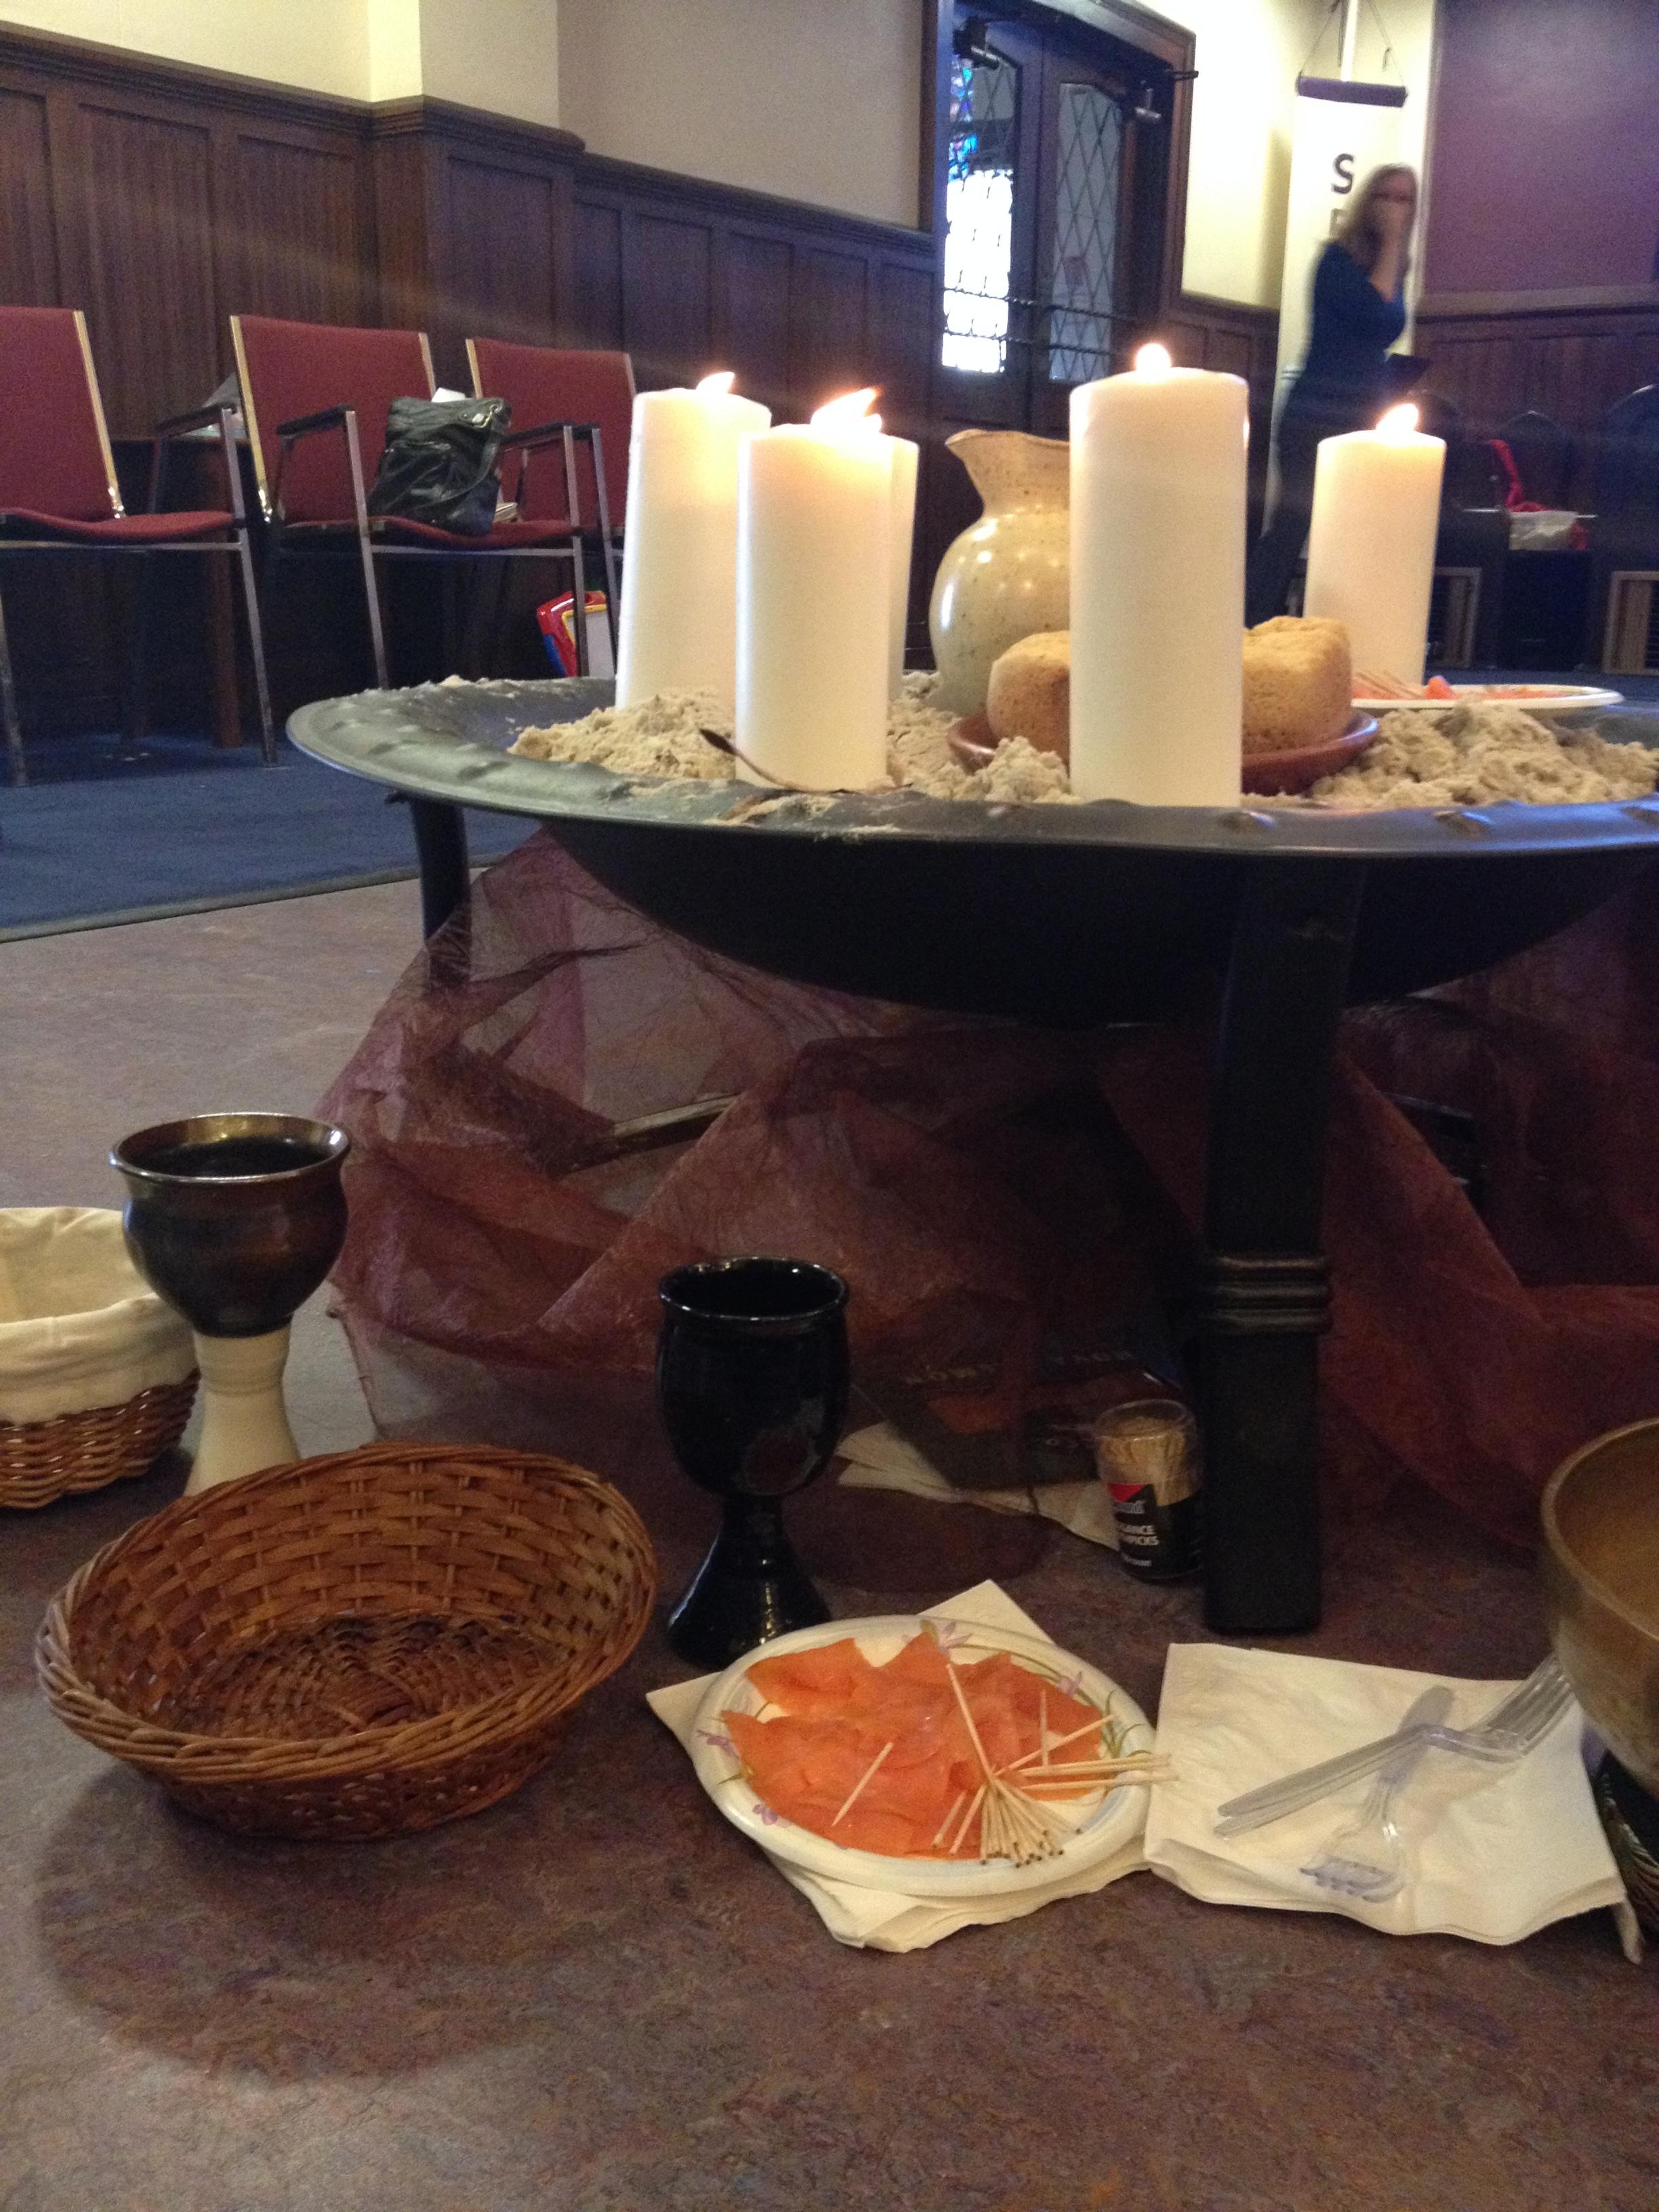 Breakfast by the Sea Communion Setting, based on John 21, created by Ashley Goff. Church of the Pilgrims, Washington, DC.